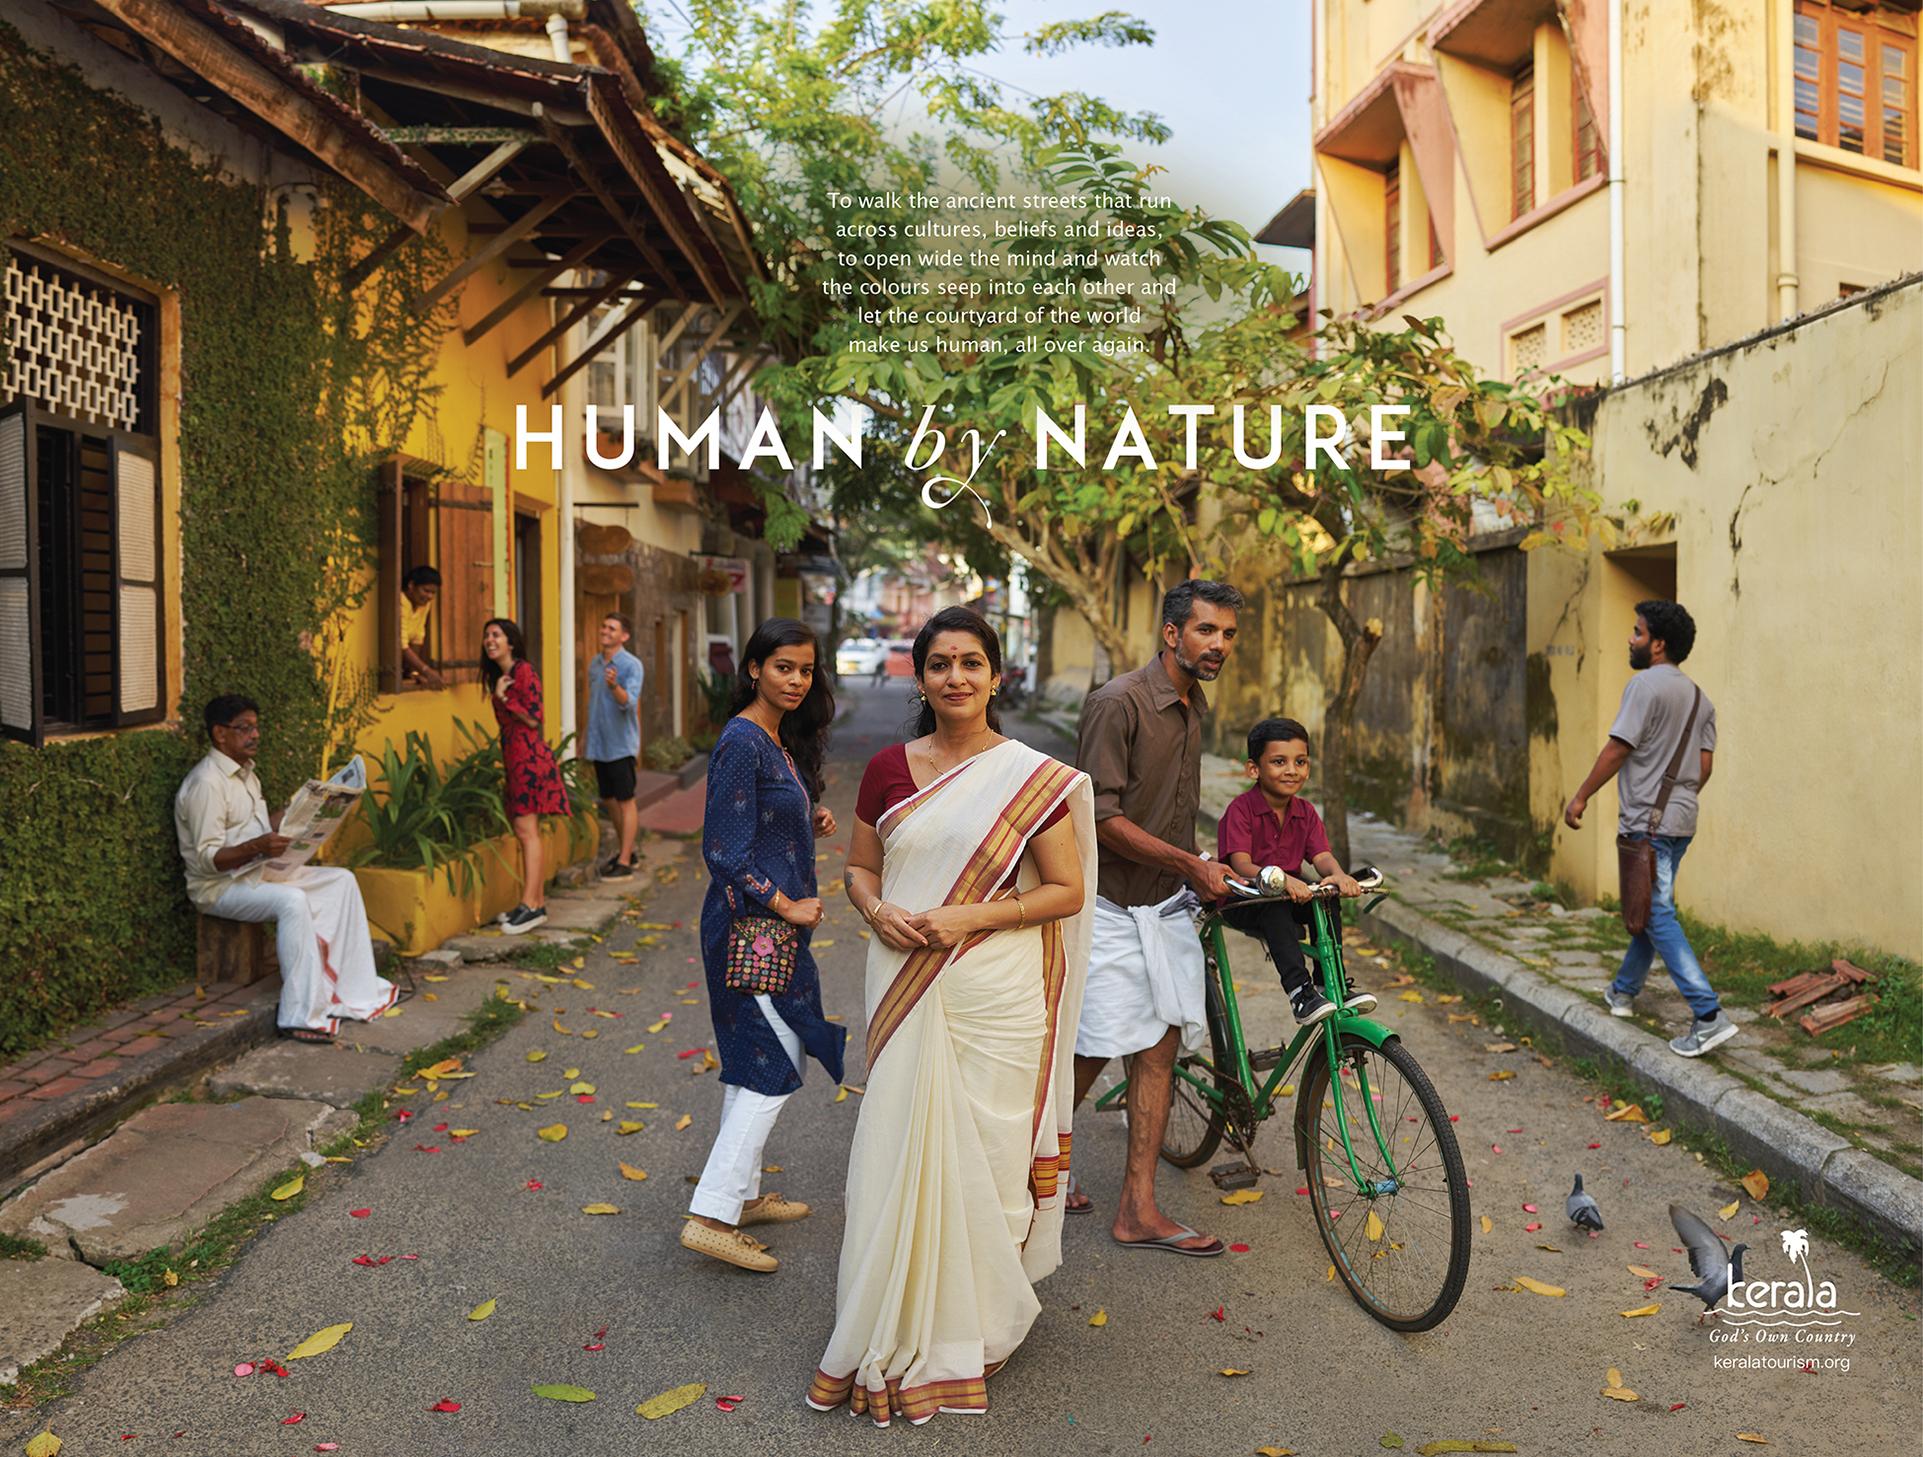 Human by Nature (4) - Kerala Tourism Promotions | Joey L | Stark Communications Pvt Ltd